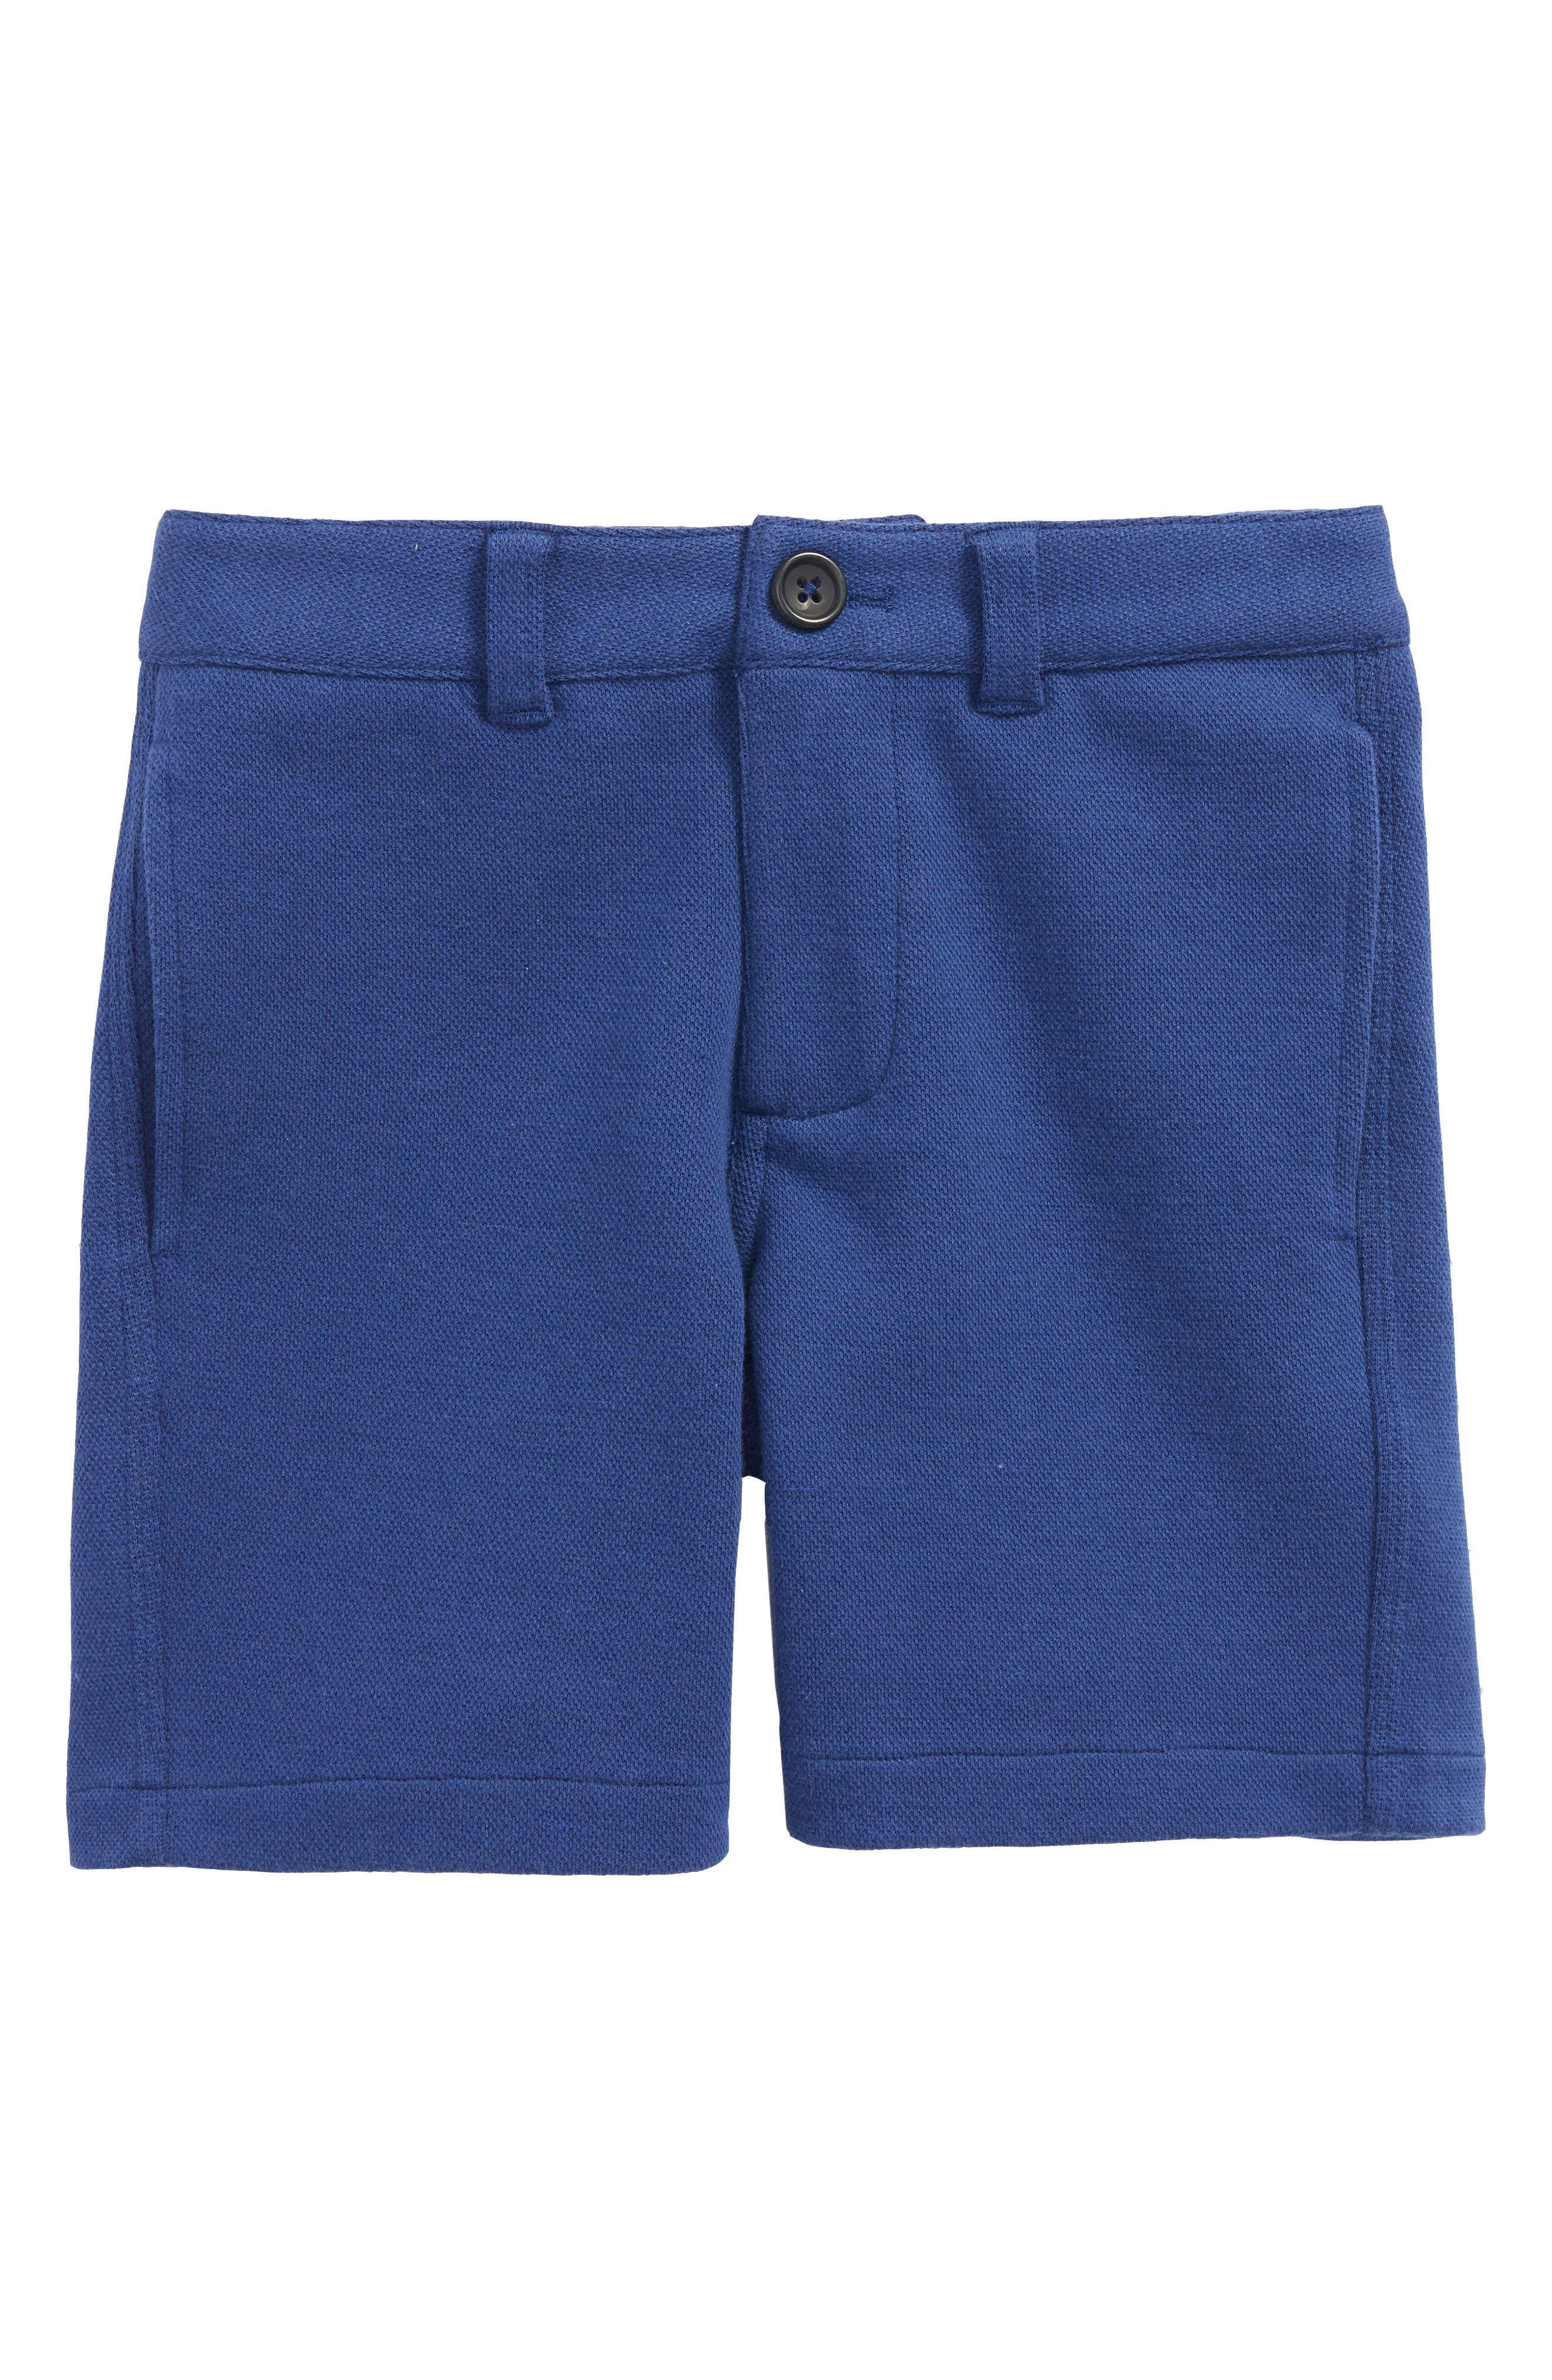 Jersey Chino Shorts,                             Main thumbnail 1, color,                             Beacon Blue